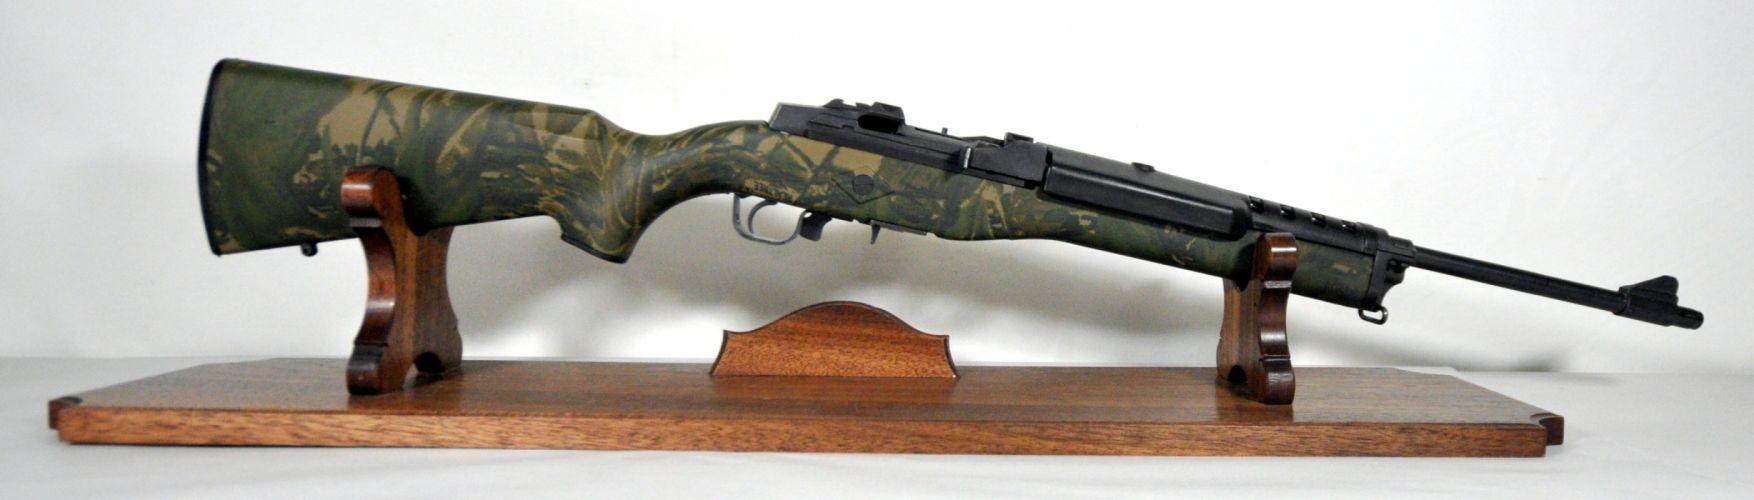 MINI-14 assault rifle weapon gun military mini (42) wallpaper